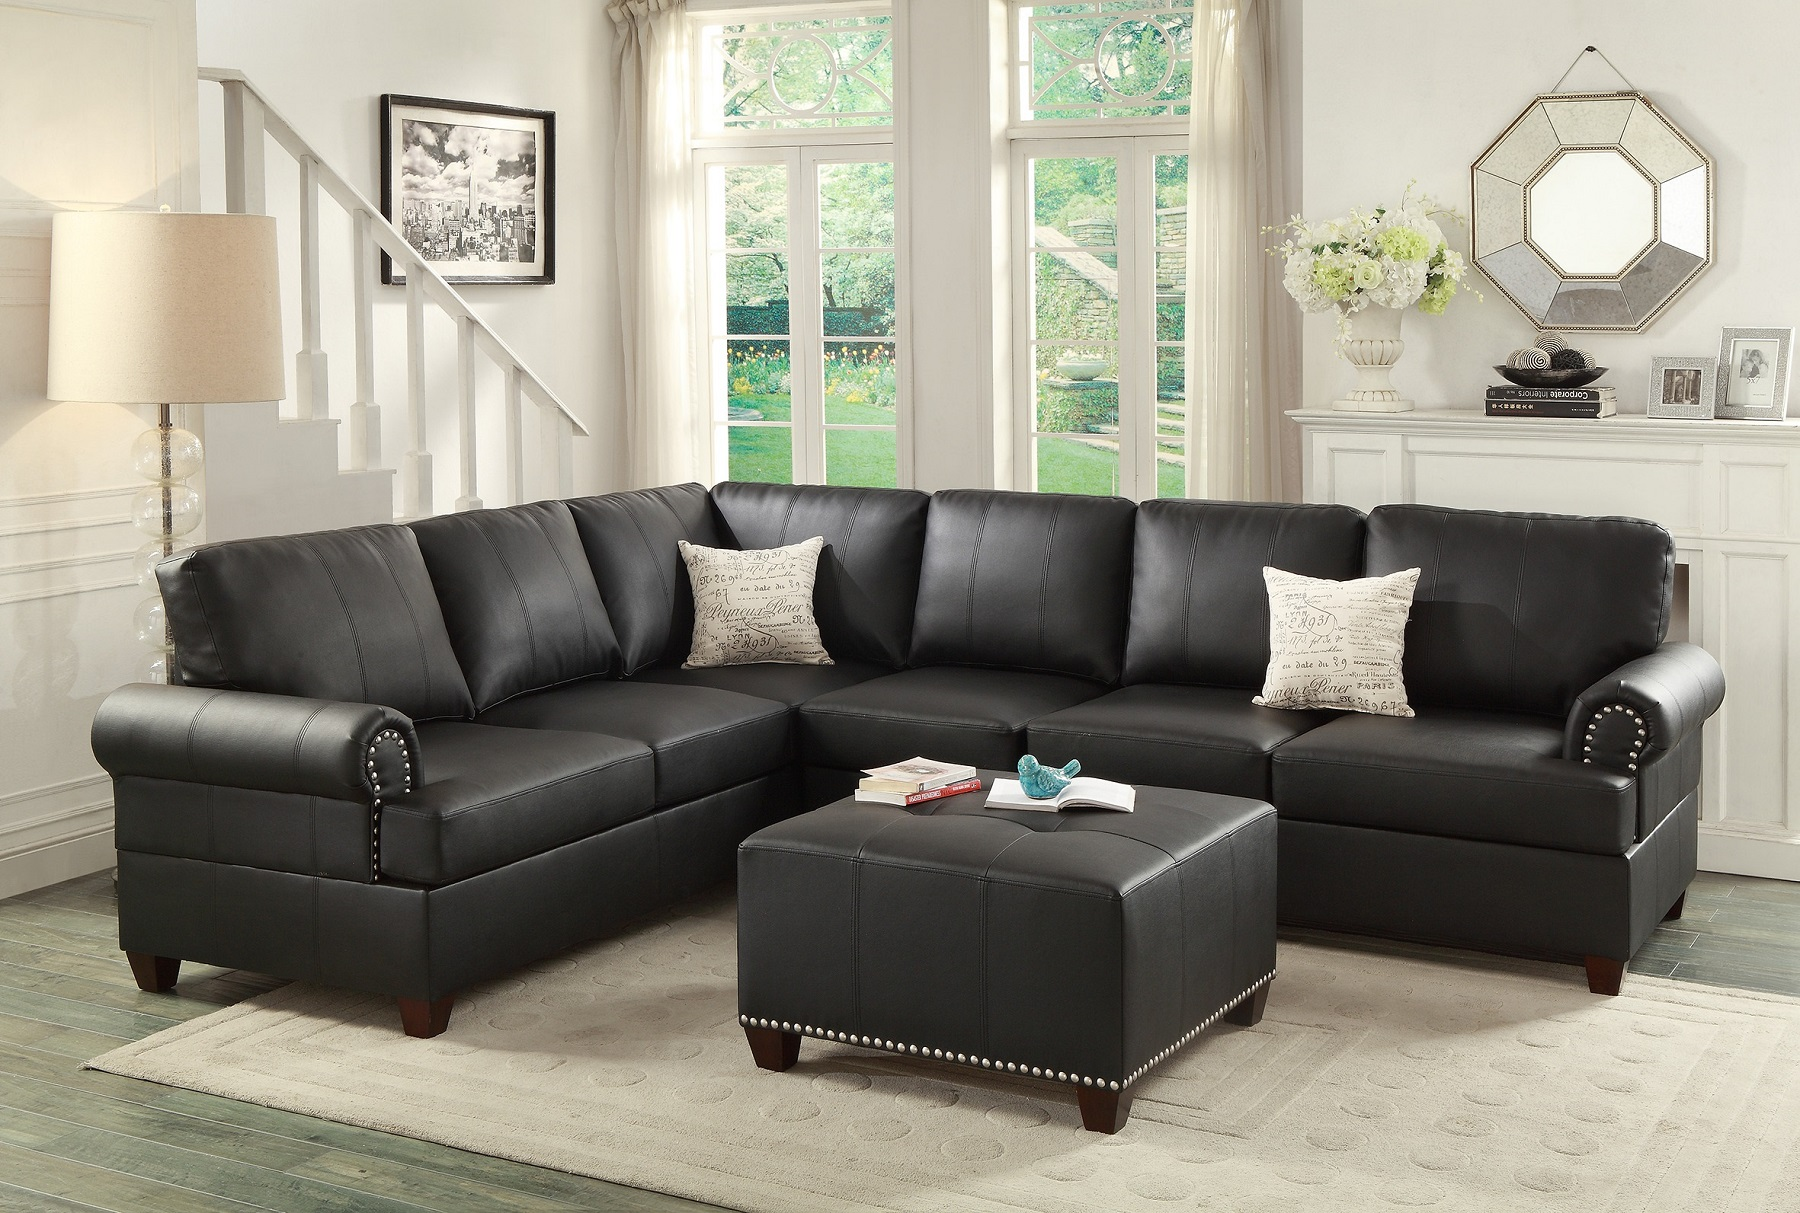 black leather sectional sofa loveseat wedge hot sectionals. Black Bedroom Furniture Sets. Home Design Ideas